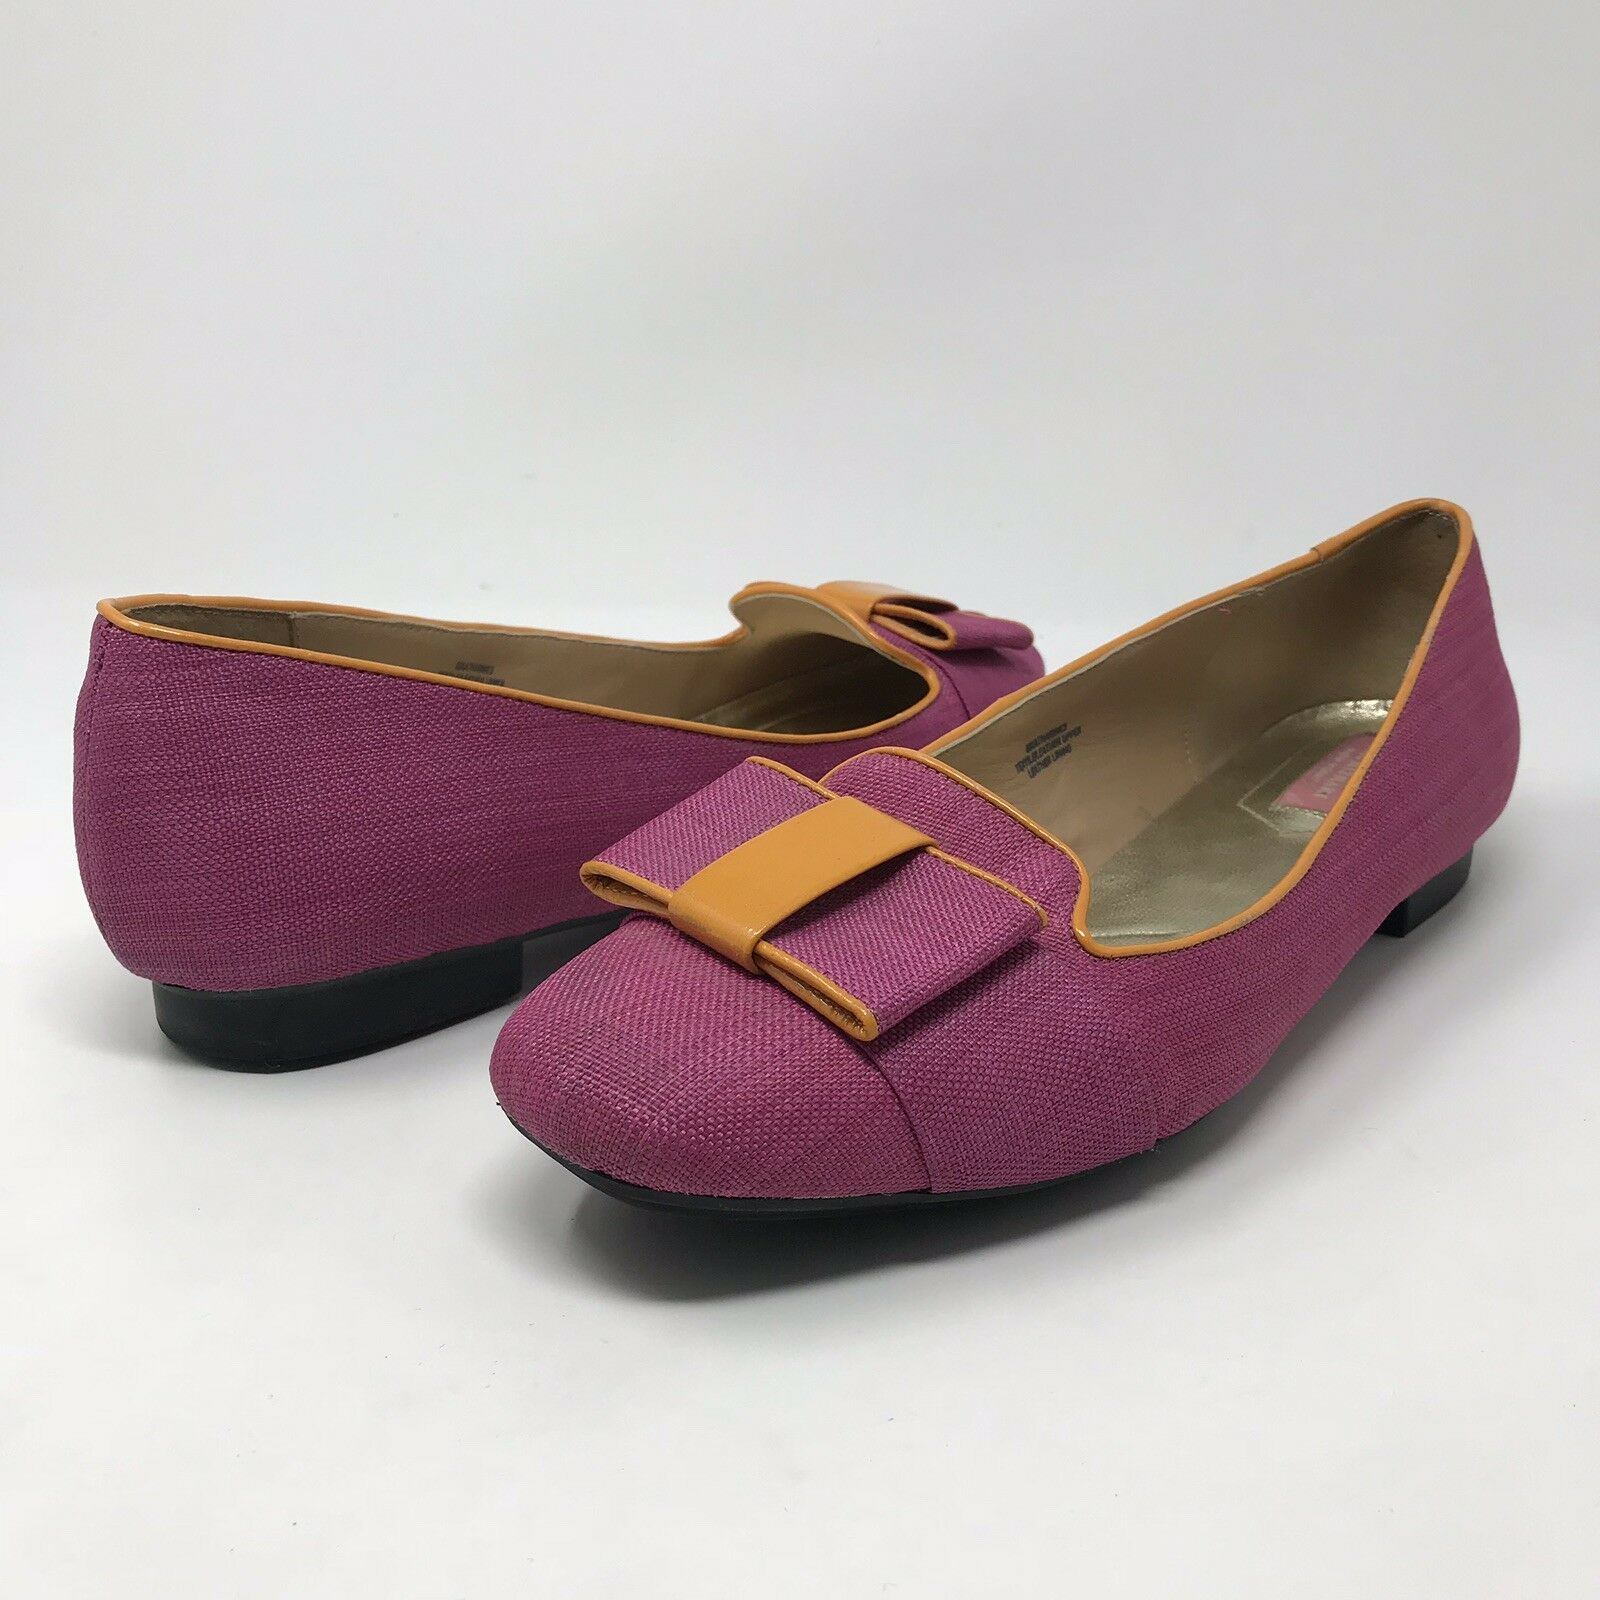 Isaac Mizrahi Katharine Magenta Pink Bow Loafers Slip On Flats Women's Size 10